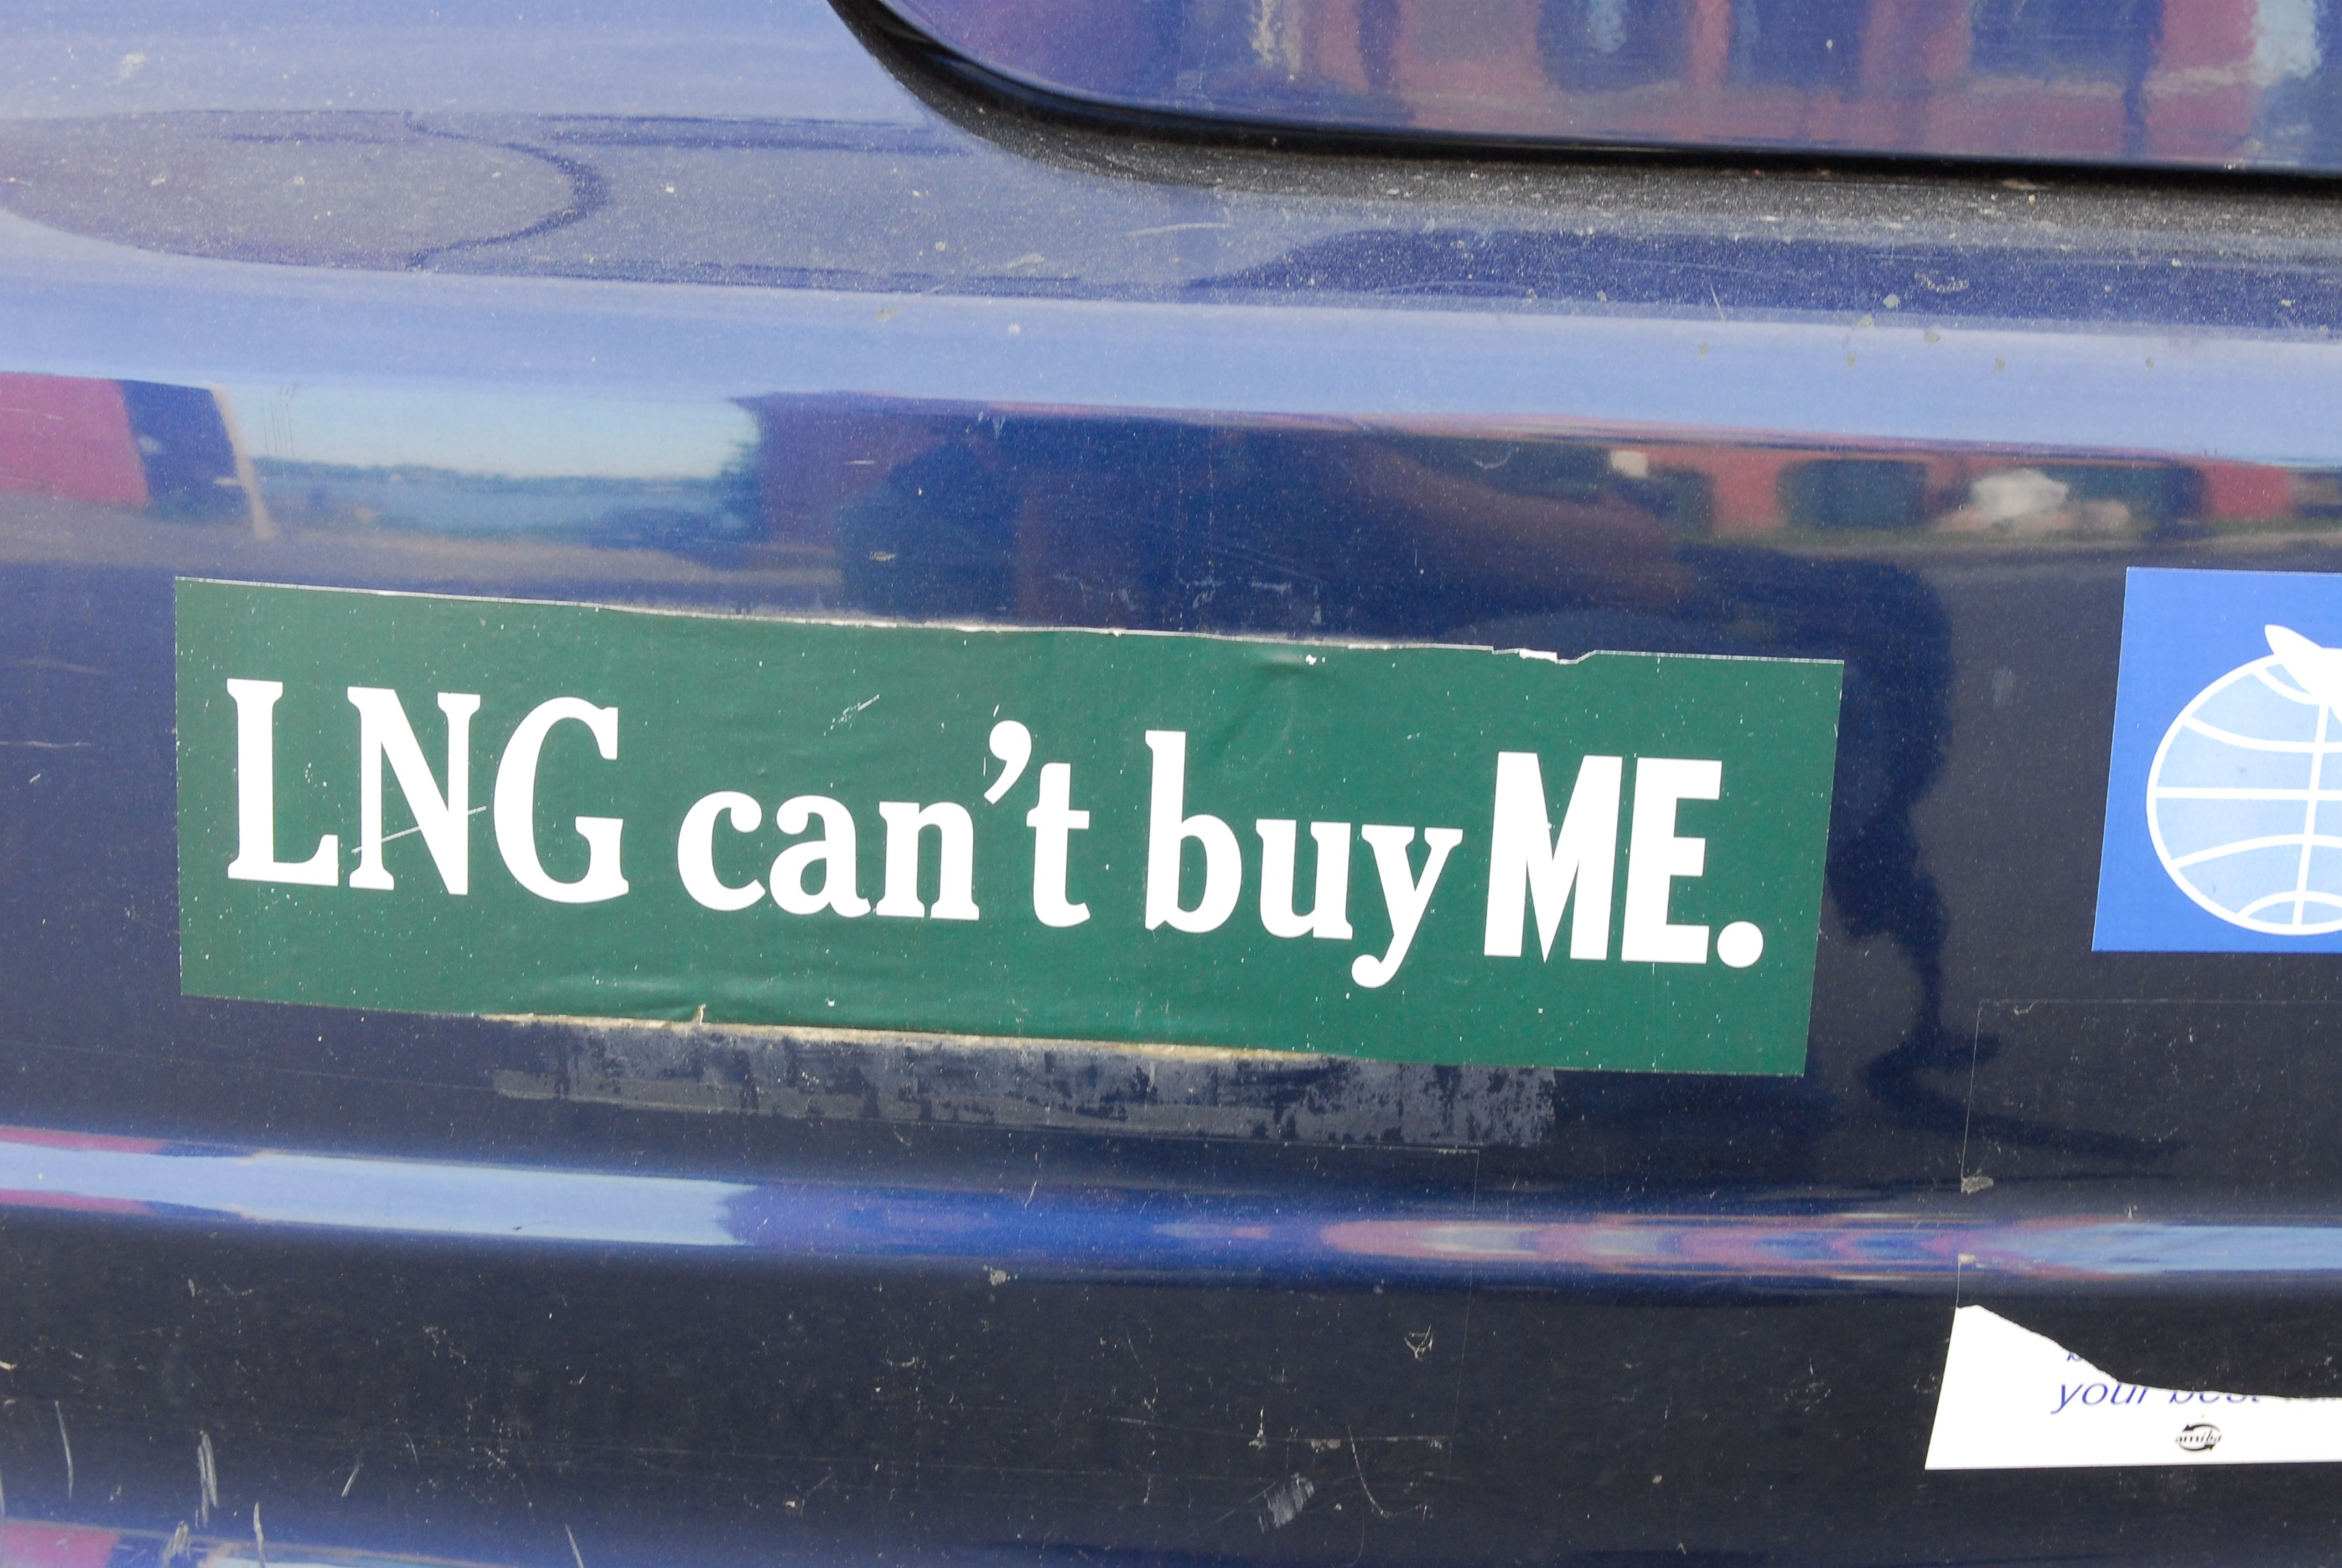 anti-lng bumper sticker